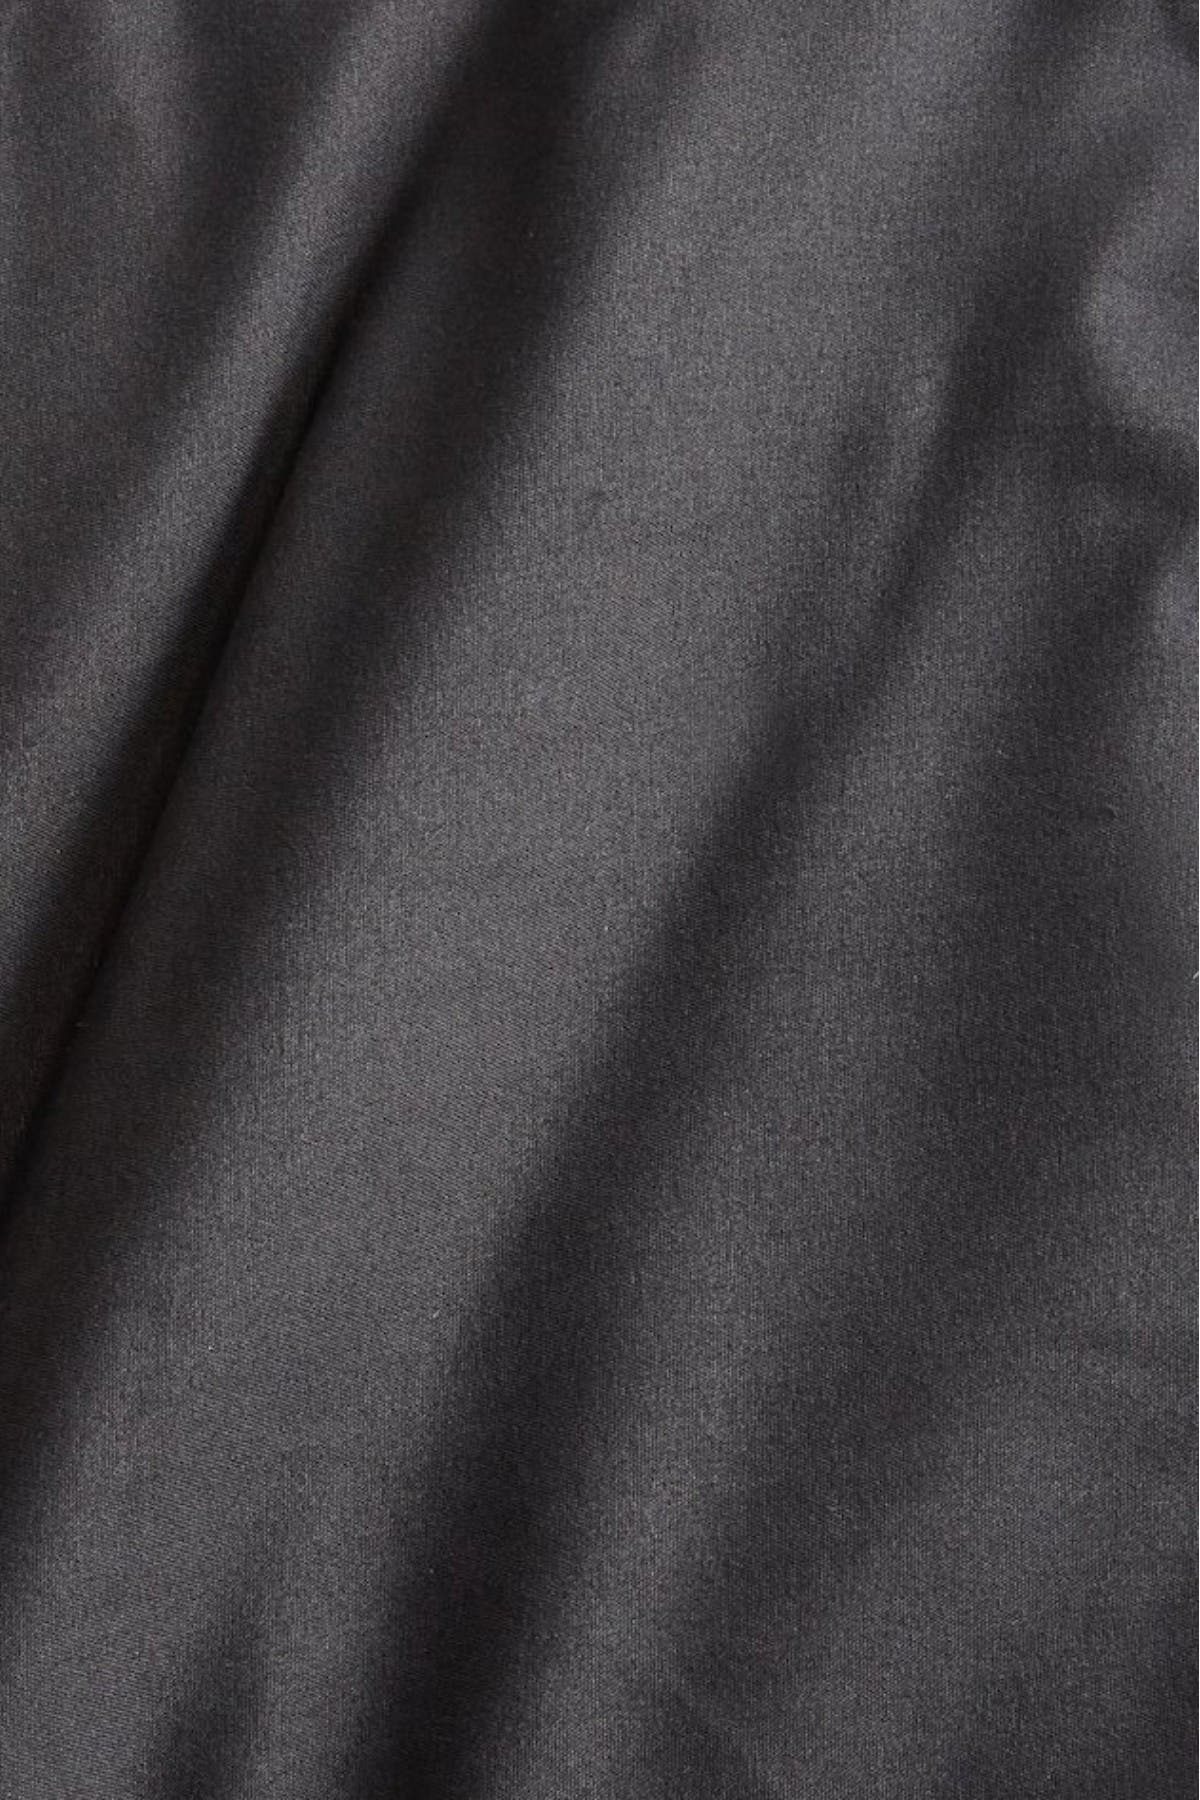 Image of Ella Jayne King All-Season Soft brushed Microfiber Down Alternative Comforter - Black